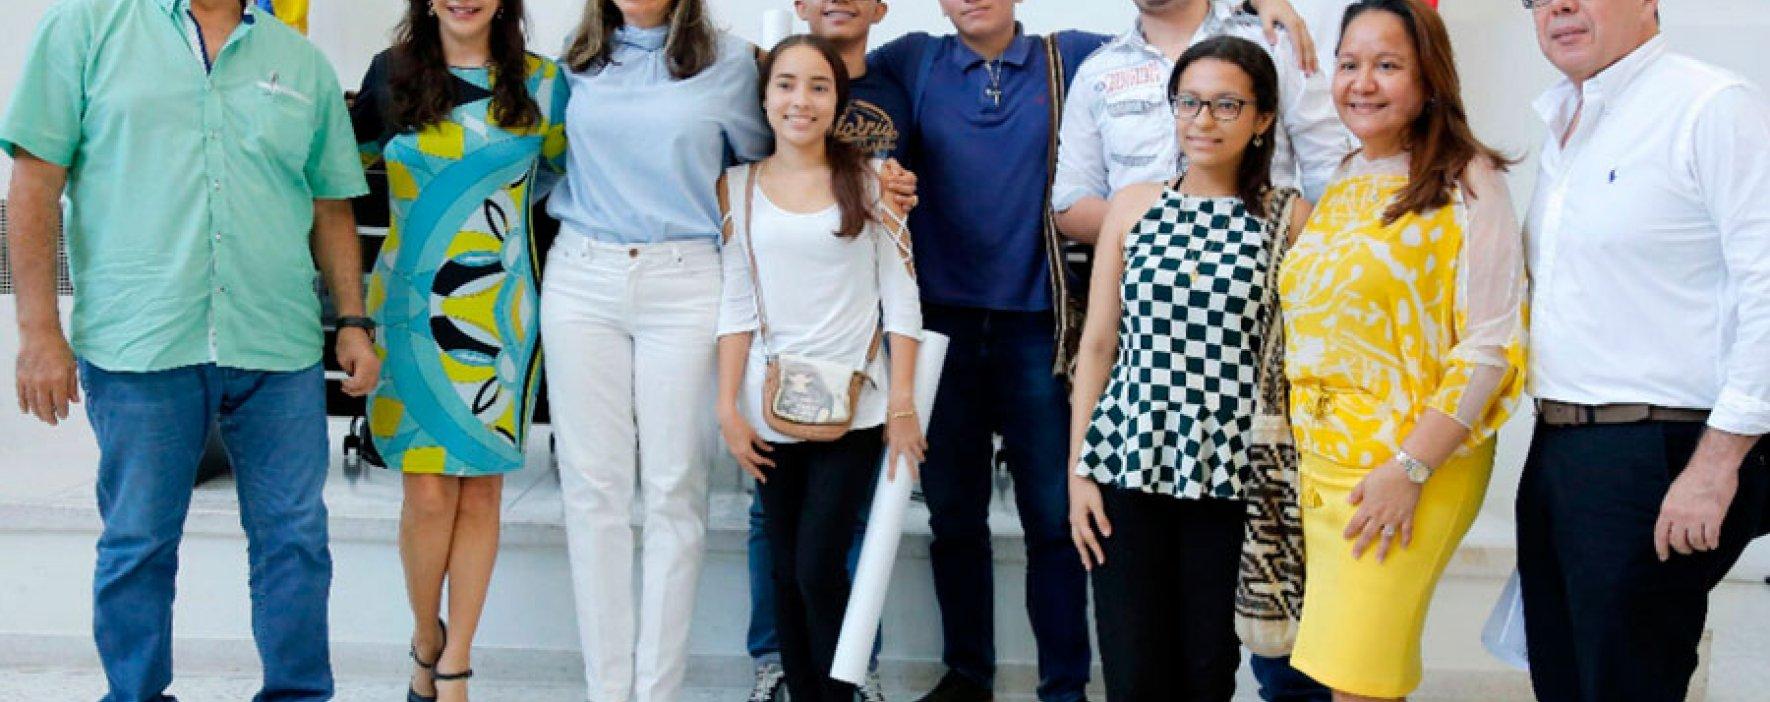 Gobernación del Atlántico ofrece 140 becas para educación superior